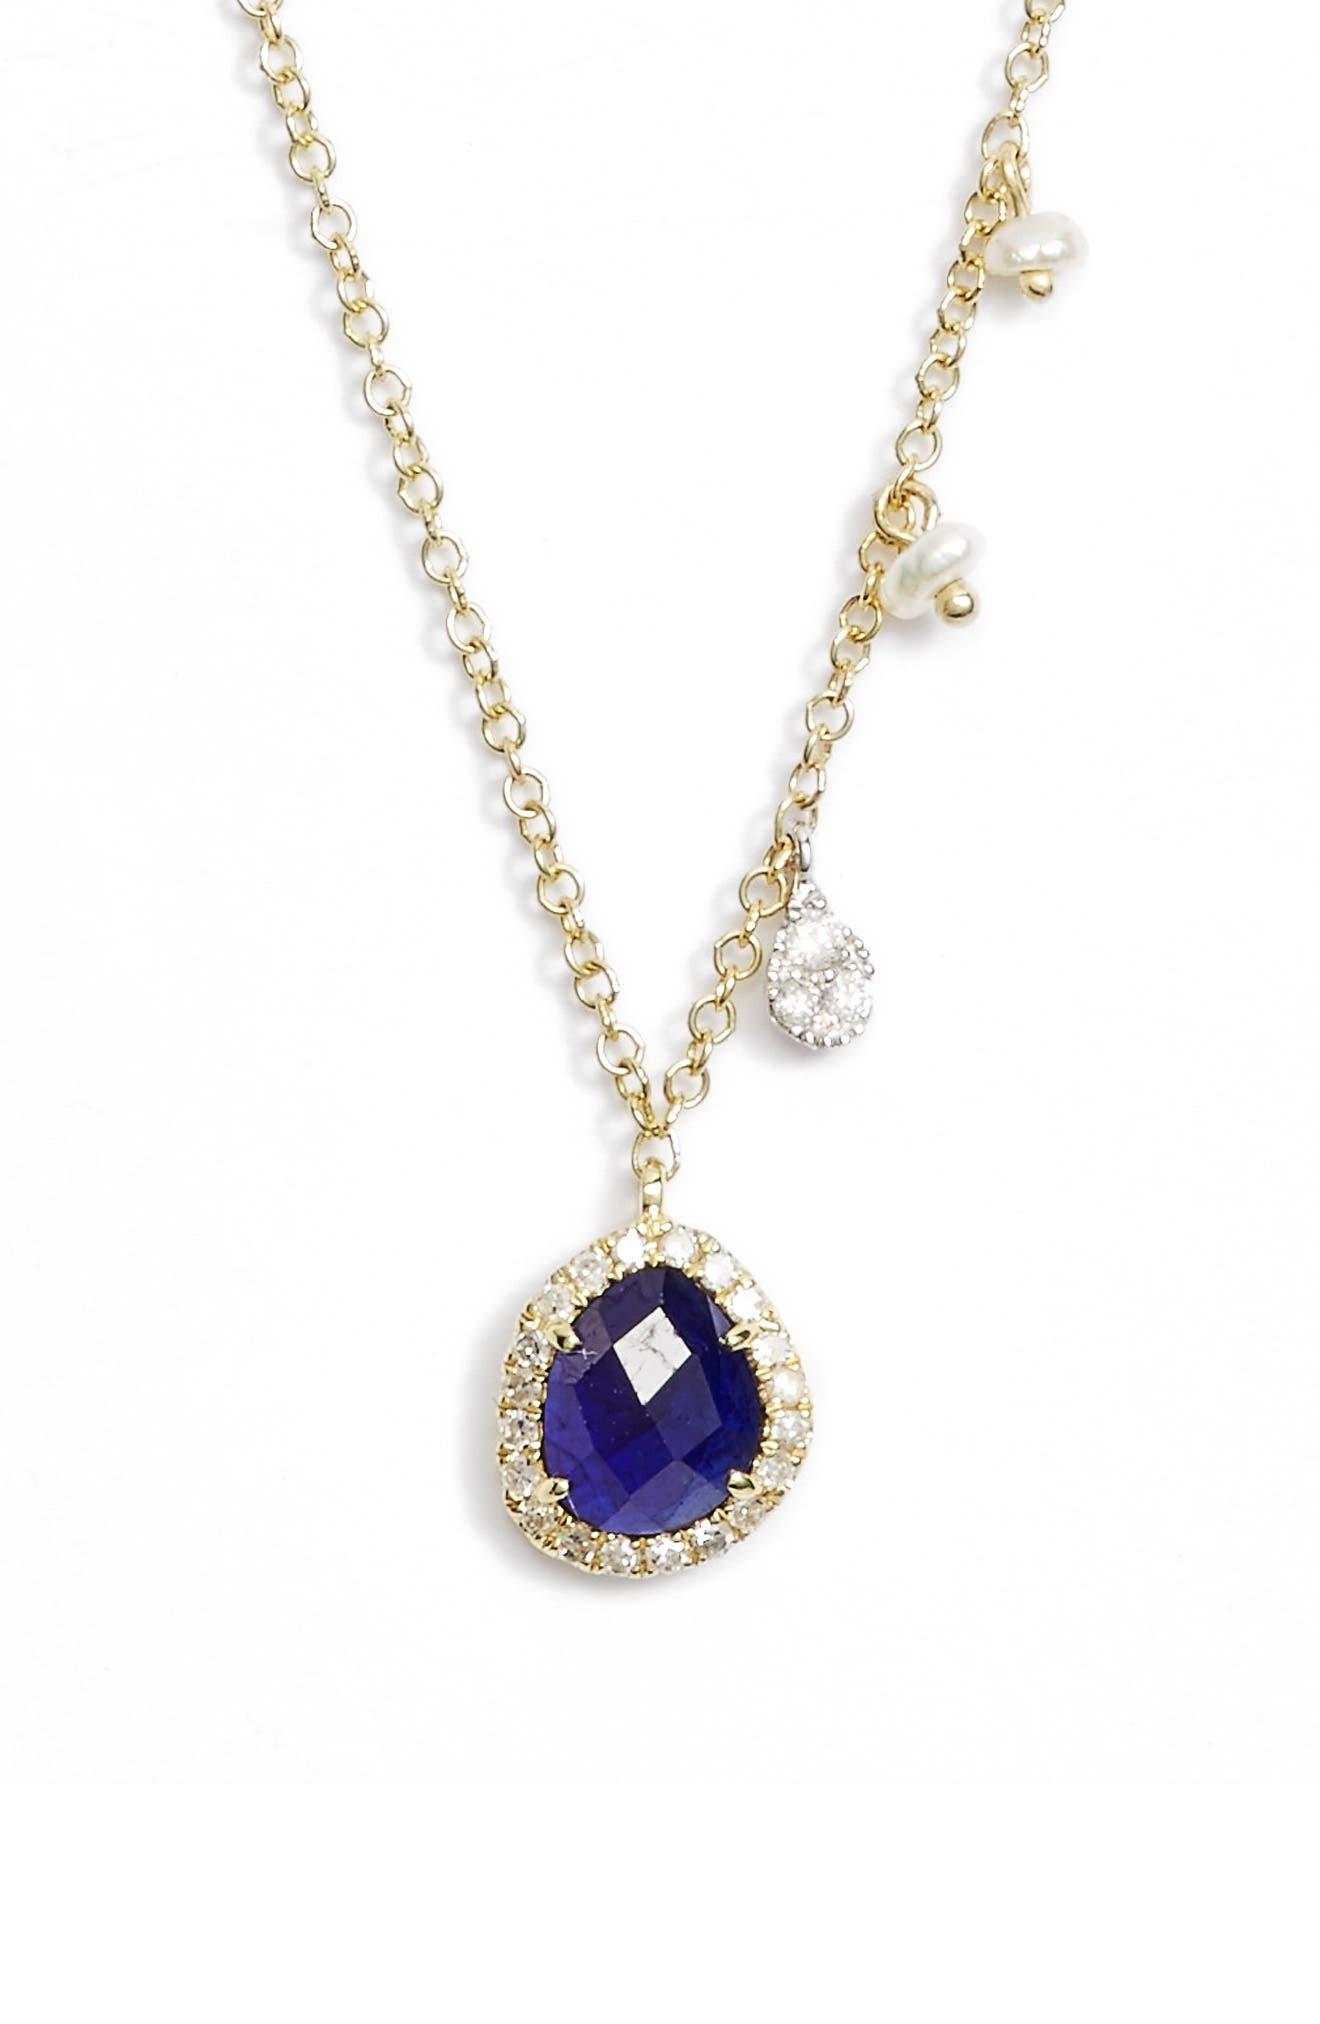 Mini Stone Diamond Pendant Necklace,                             Alternate thumbnail 2, color,                             YELLOW GOLD/ BLUE SAPPHIRE